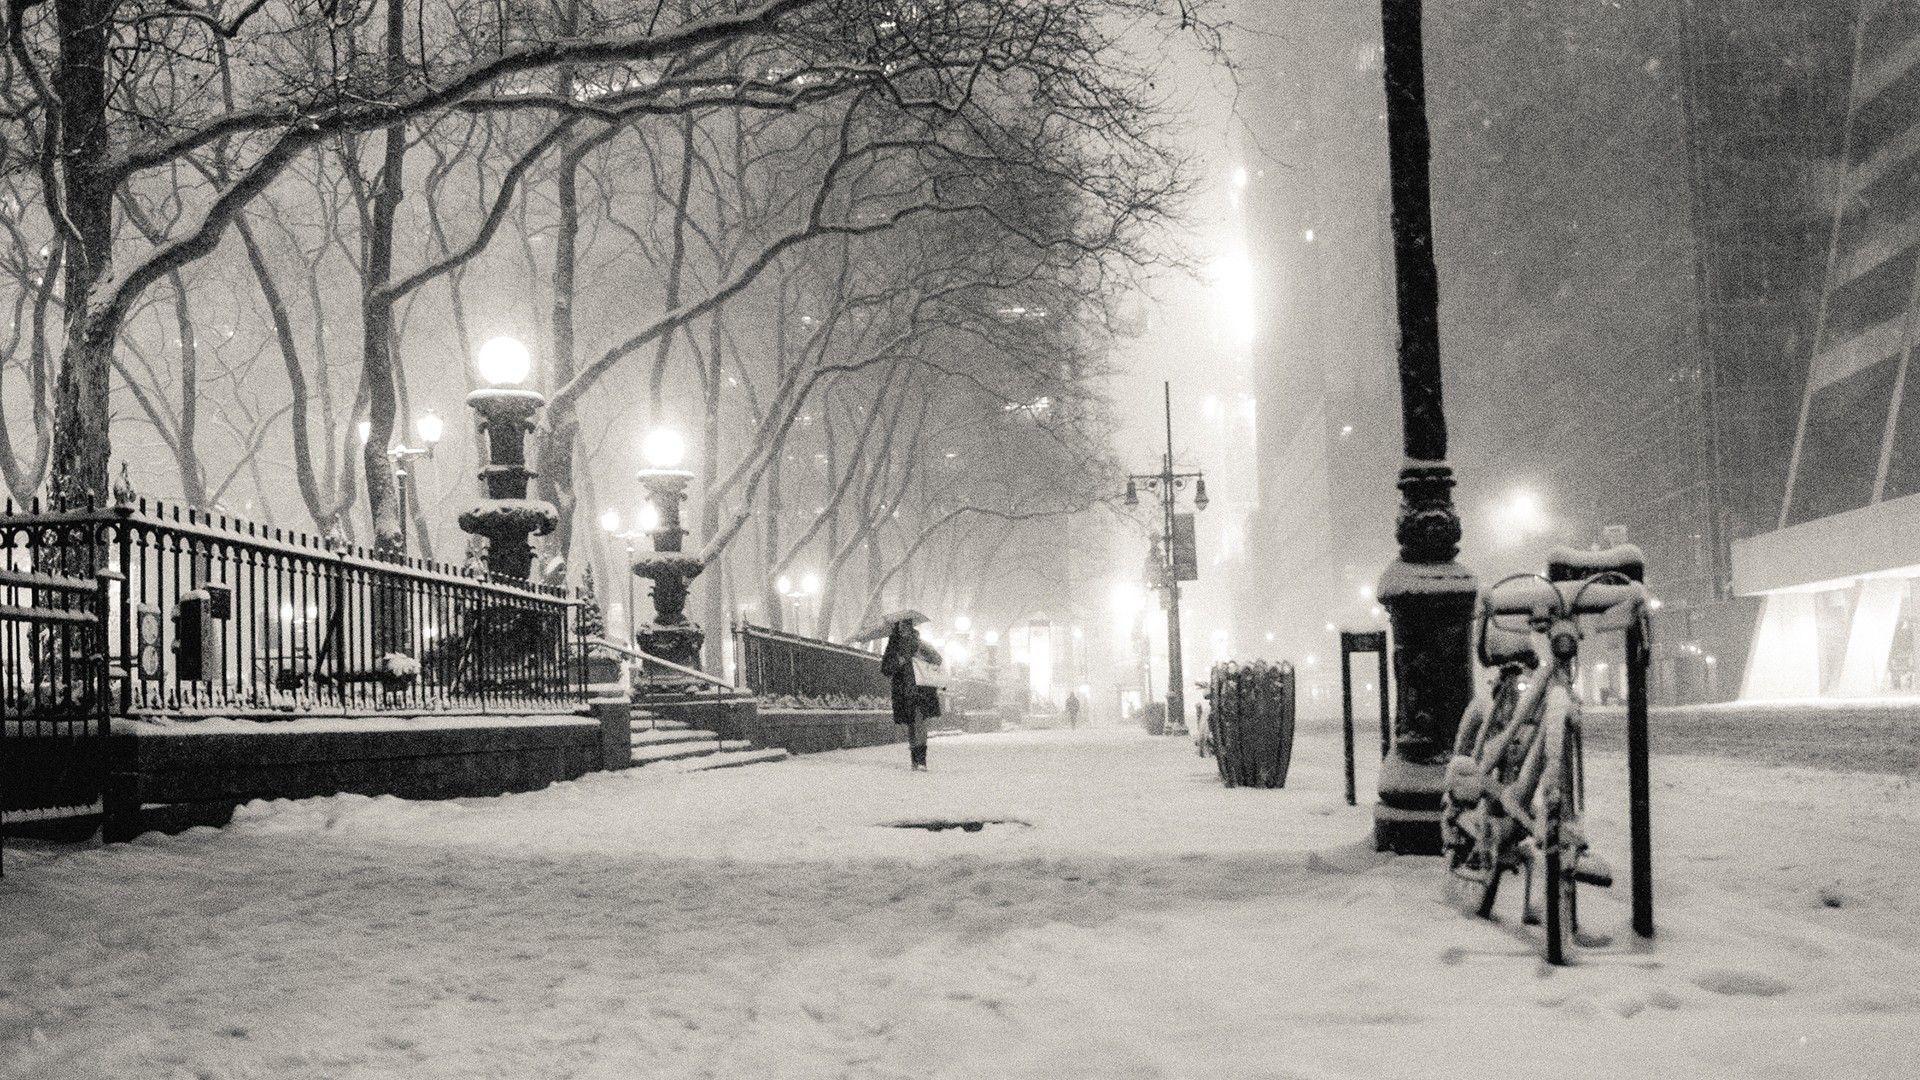 1920x1080 Black And White Winter Snow New York City Monochrome Cities Winter Background Winter Wallpaper Architecture Wallpaper